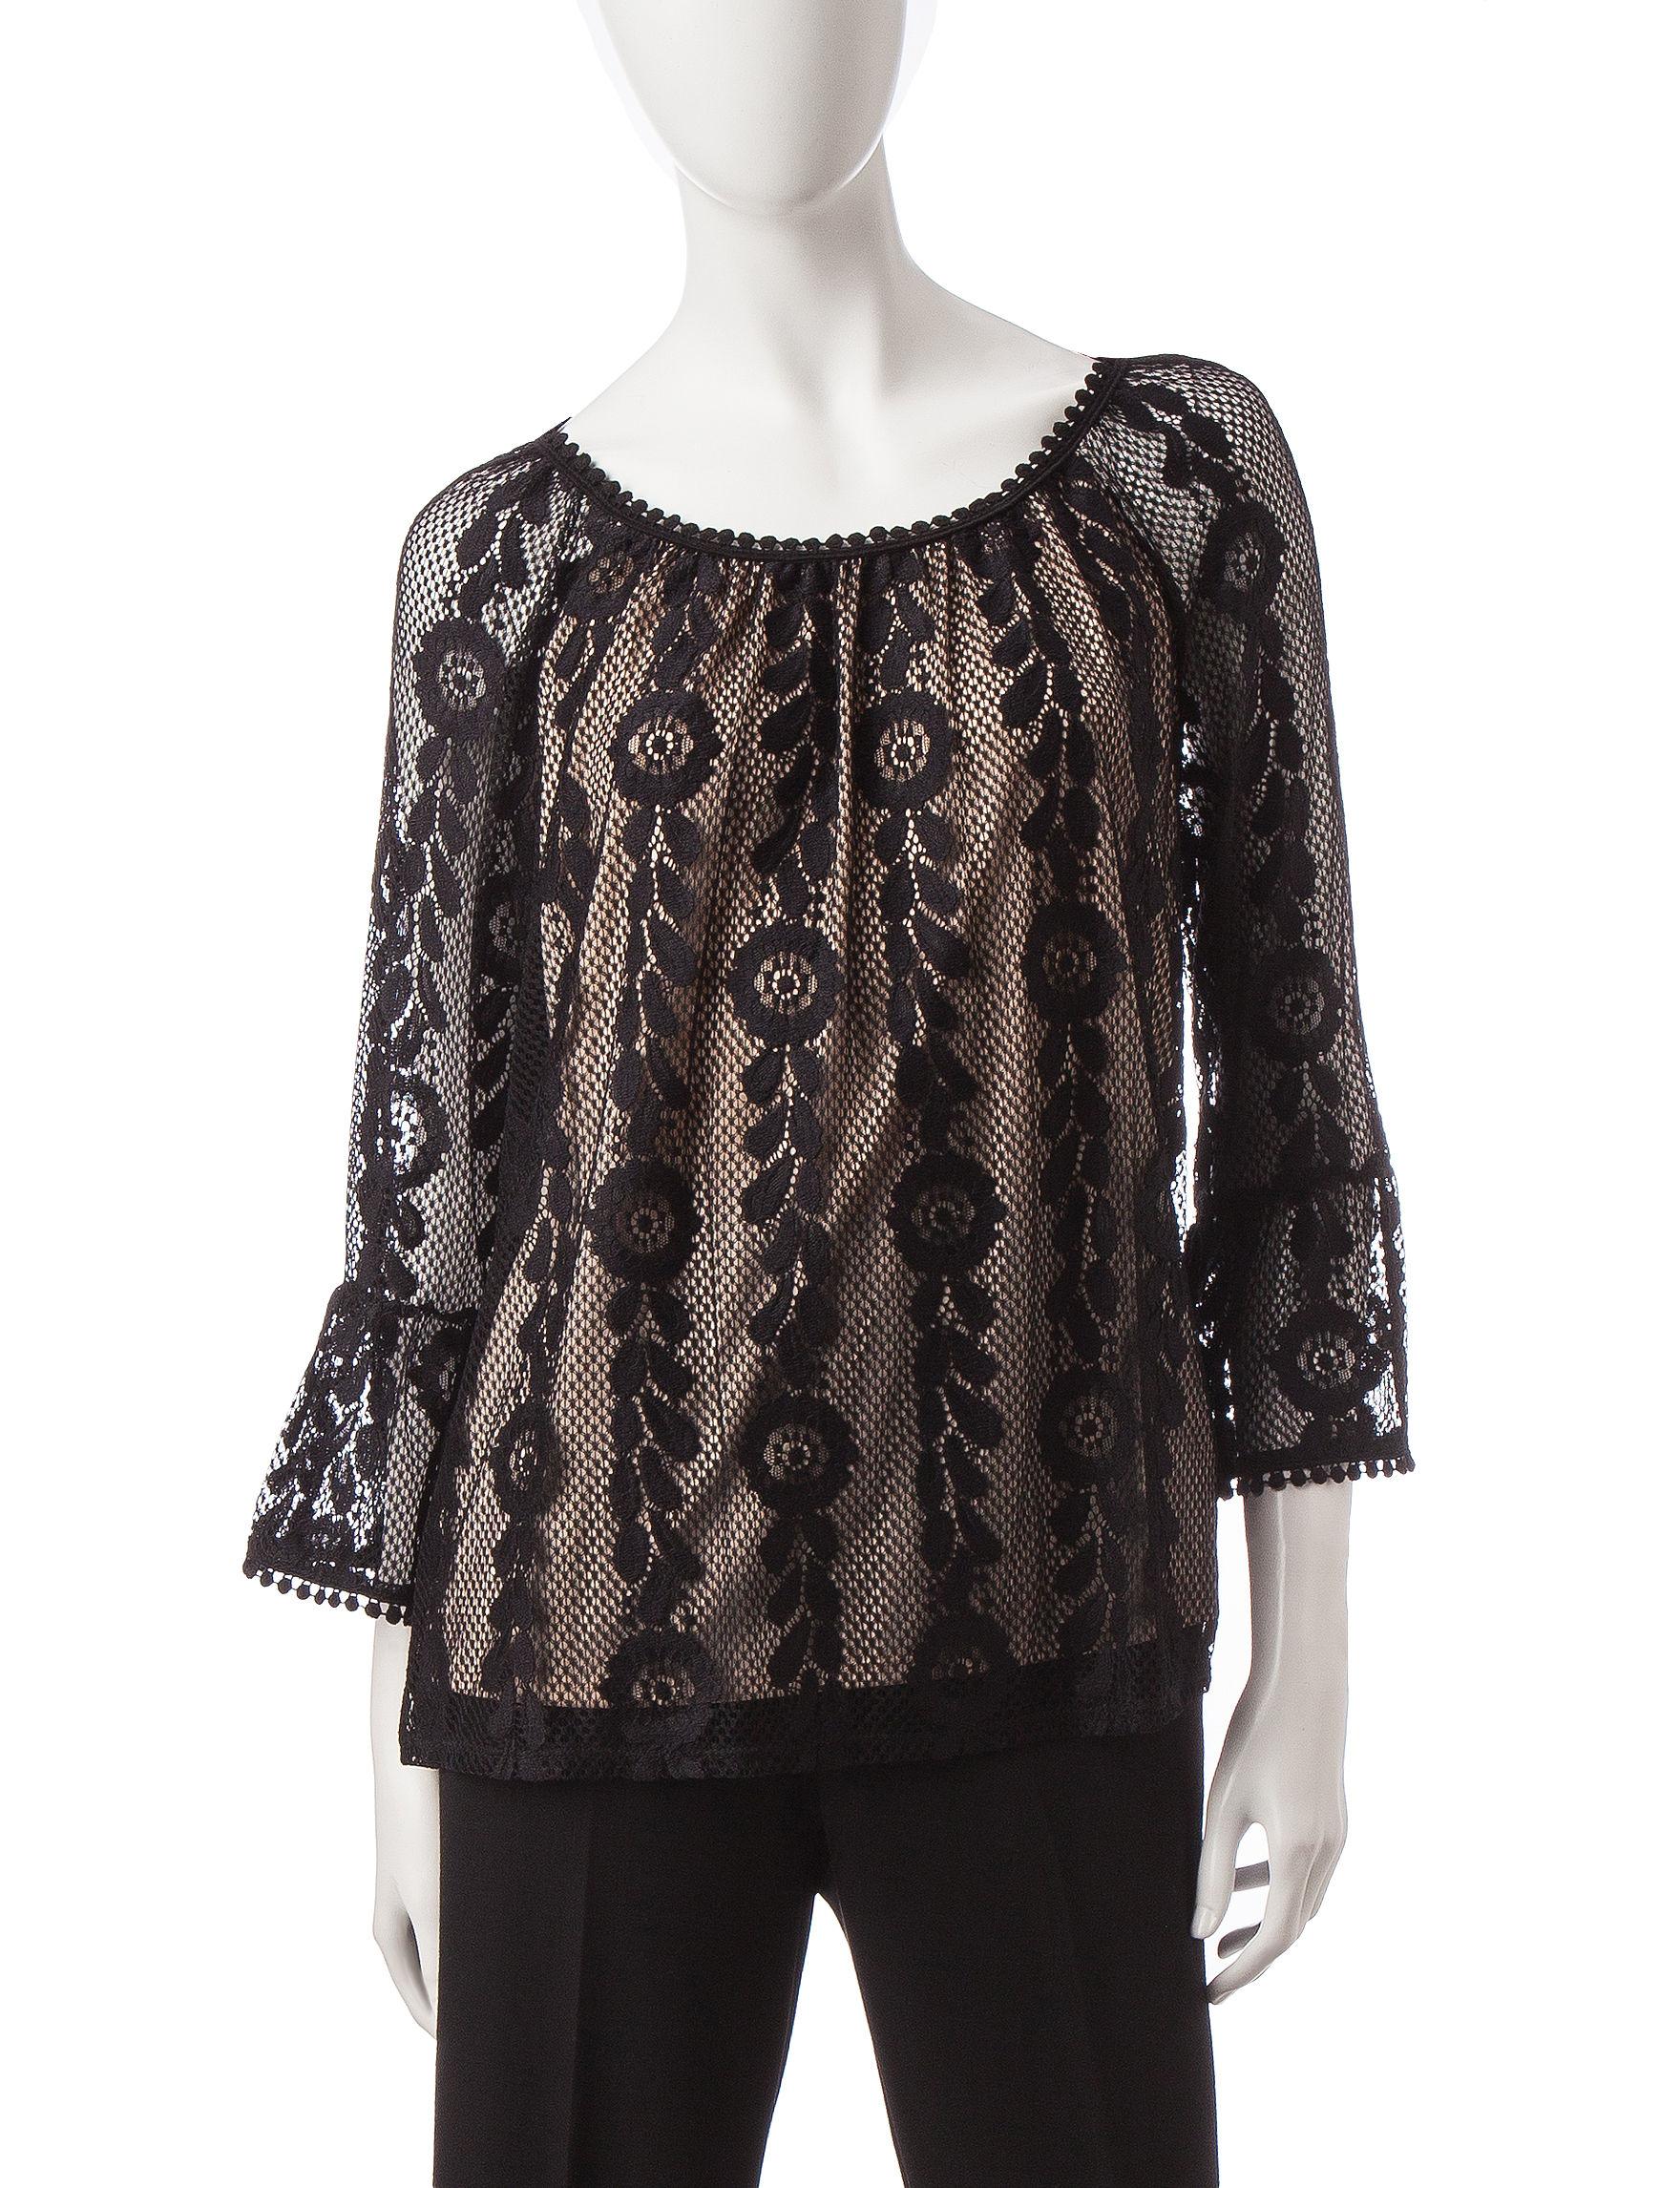 Hannah Black / Taupe Shirts & Blouses